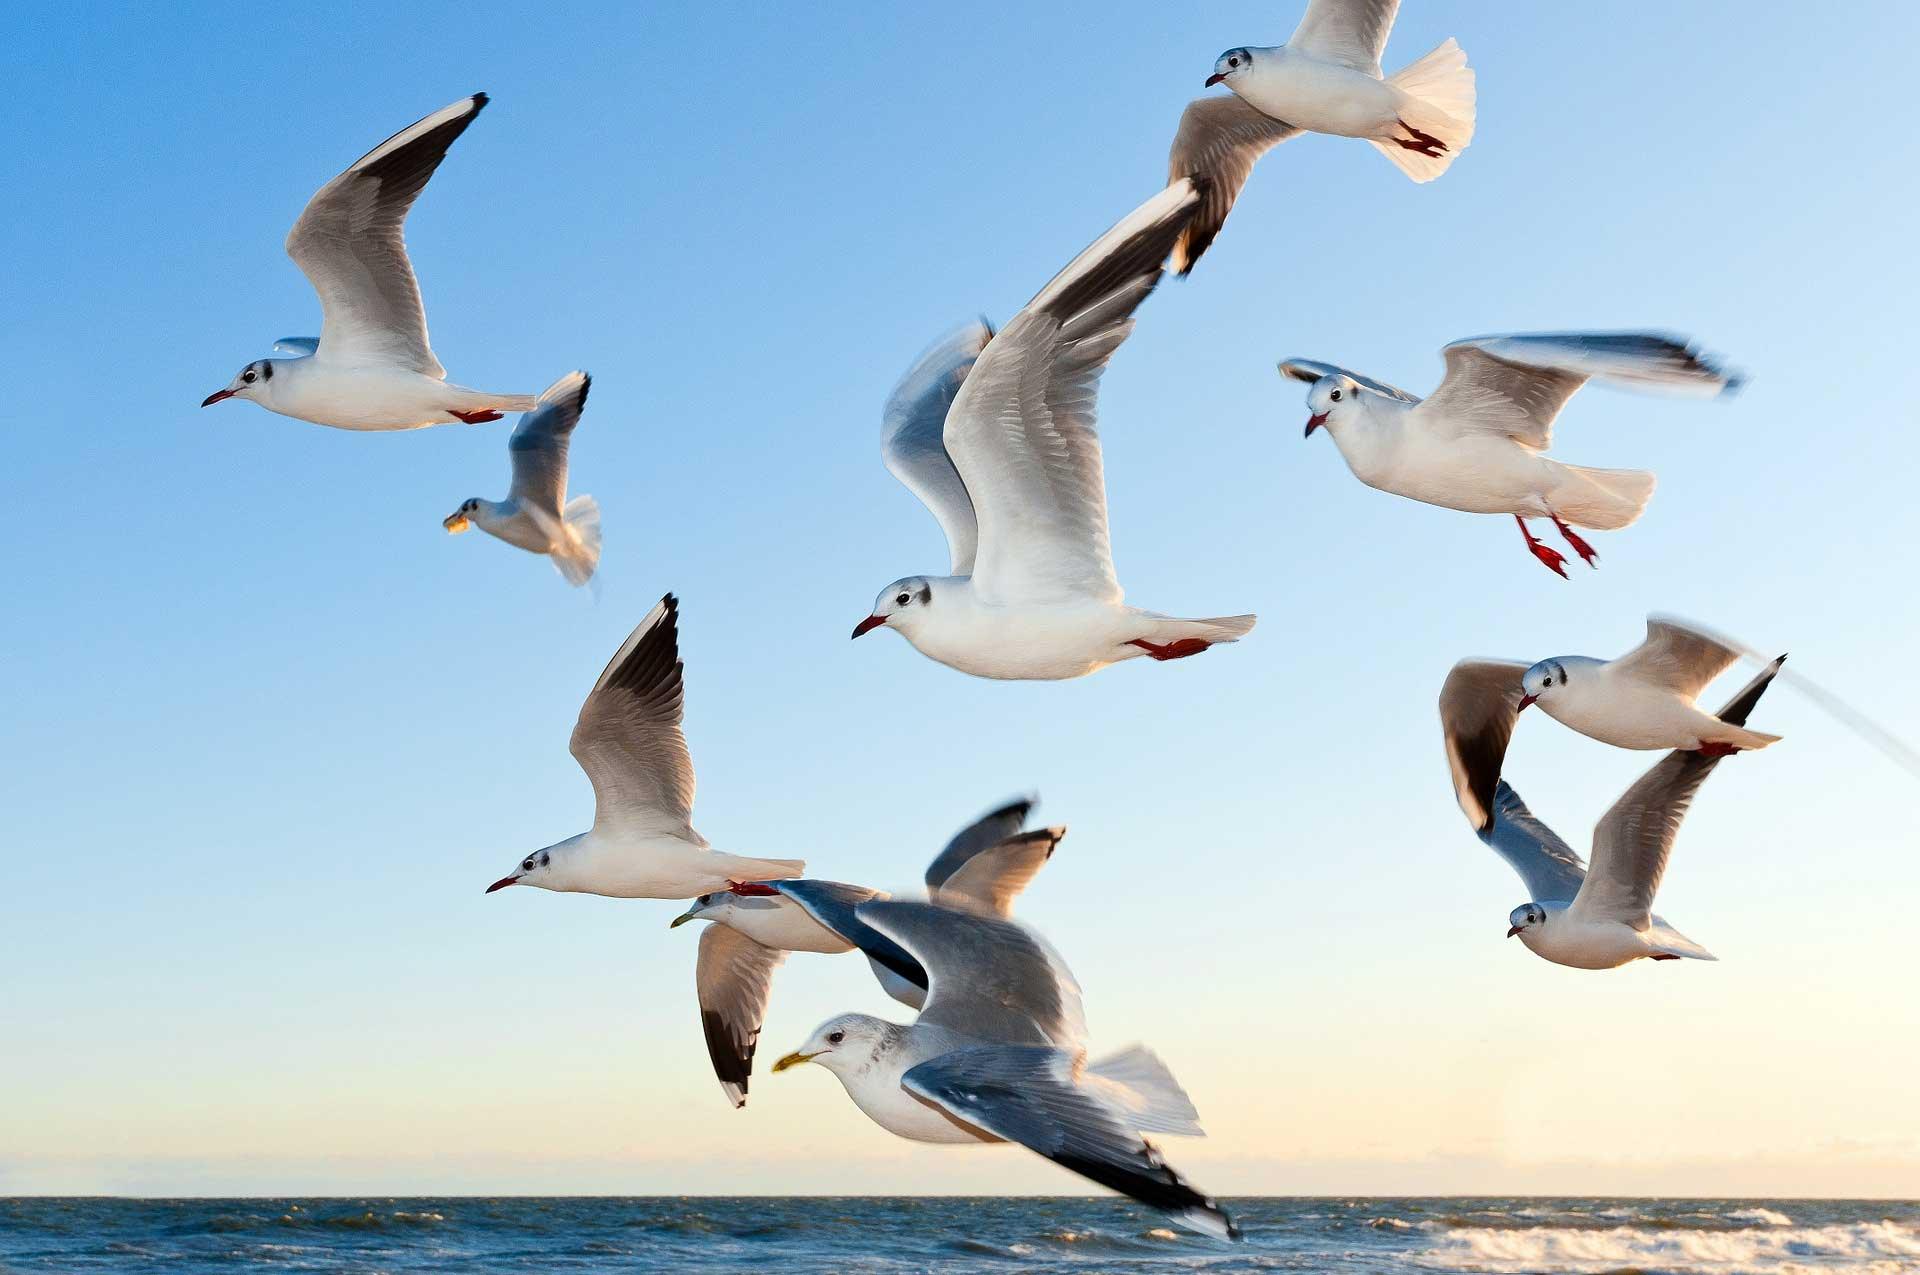 gulls_1920_web